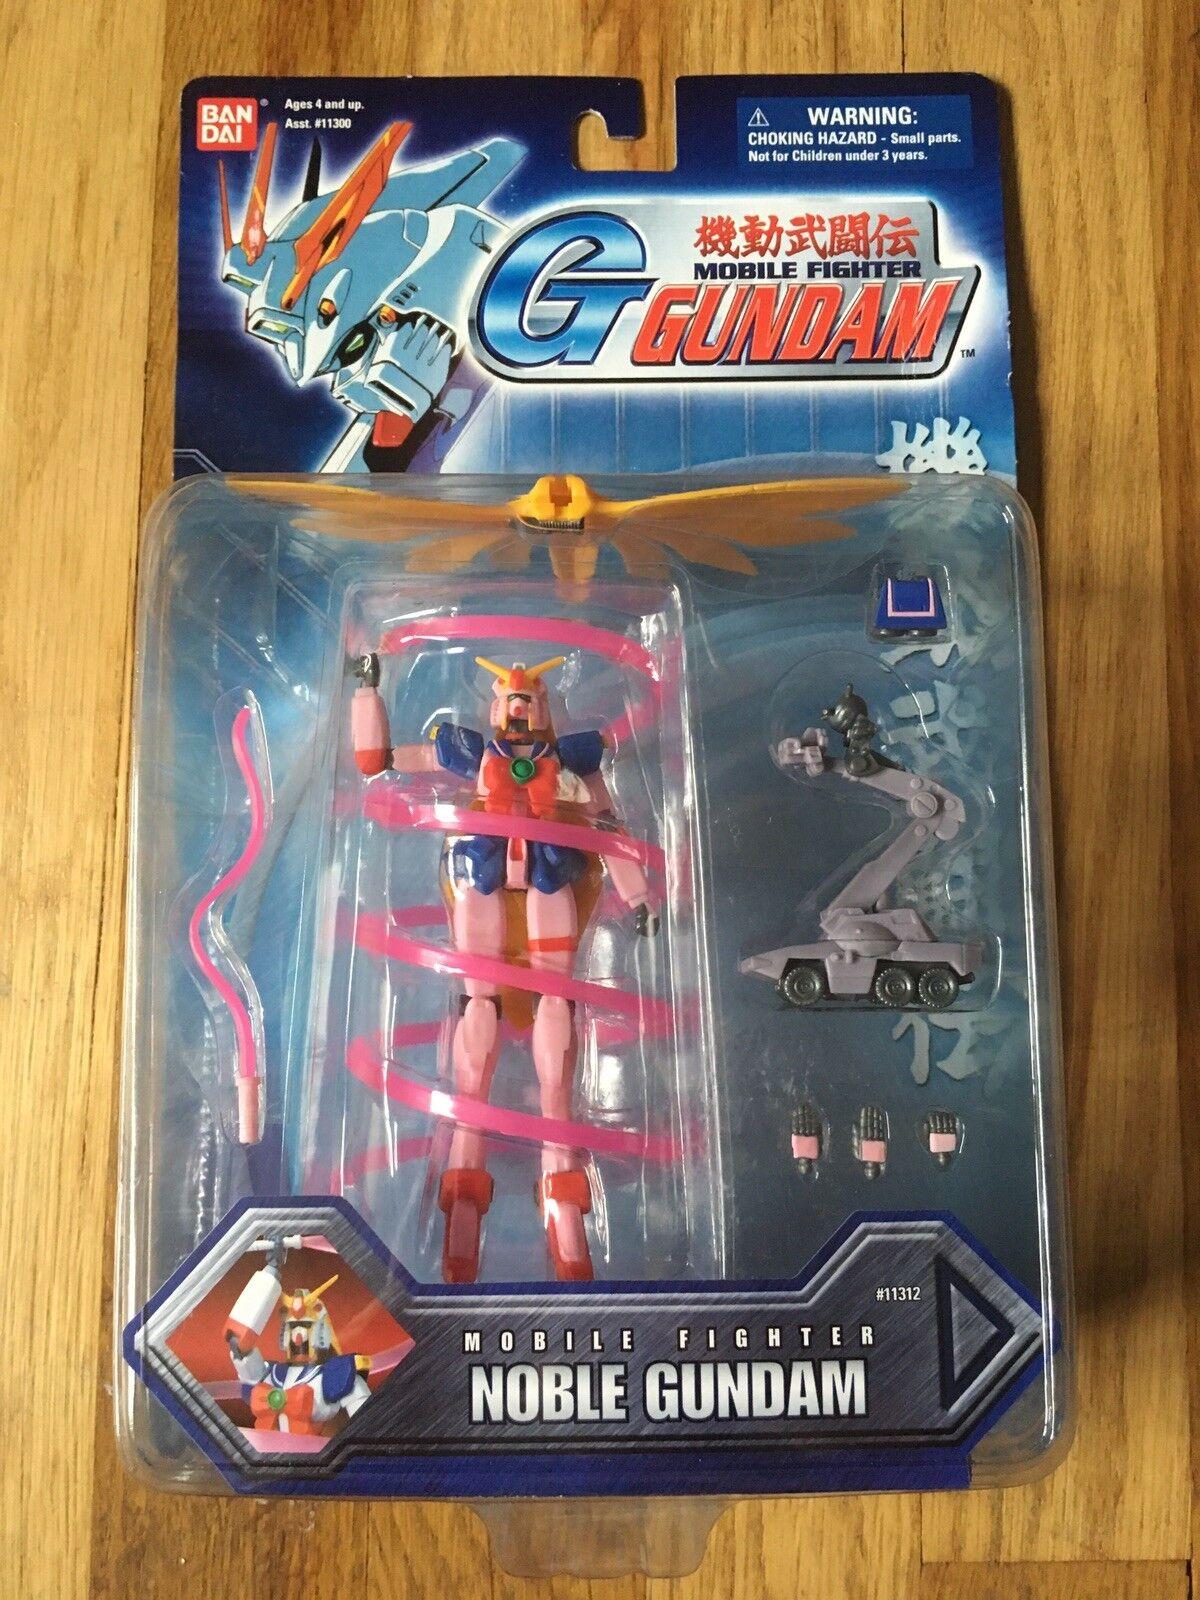 Bandai G Gundam Mobile Fighter Noble Gundam Figure